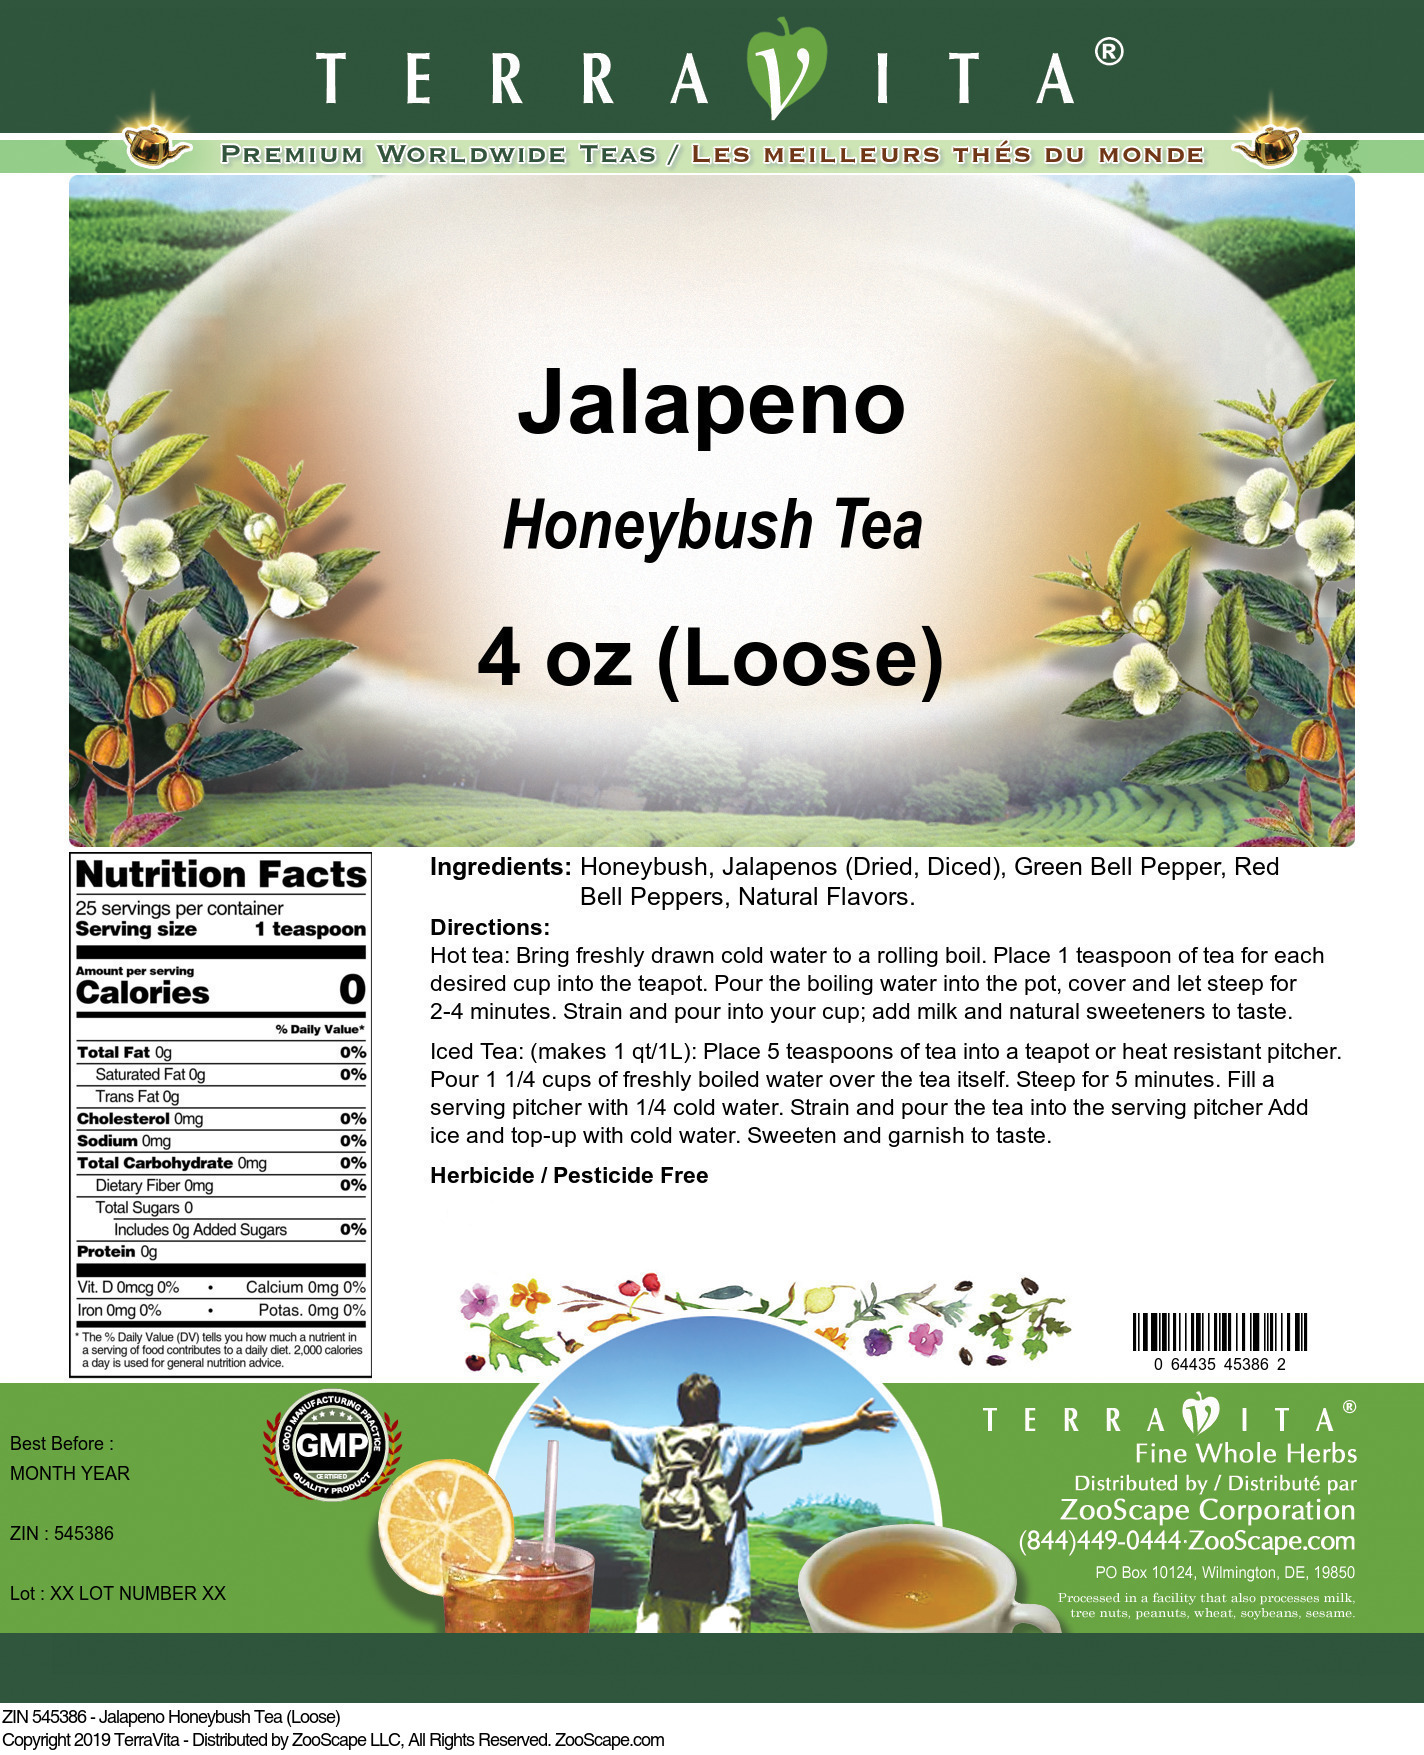 Jalapeno Honeybush Tea (Loose)